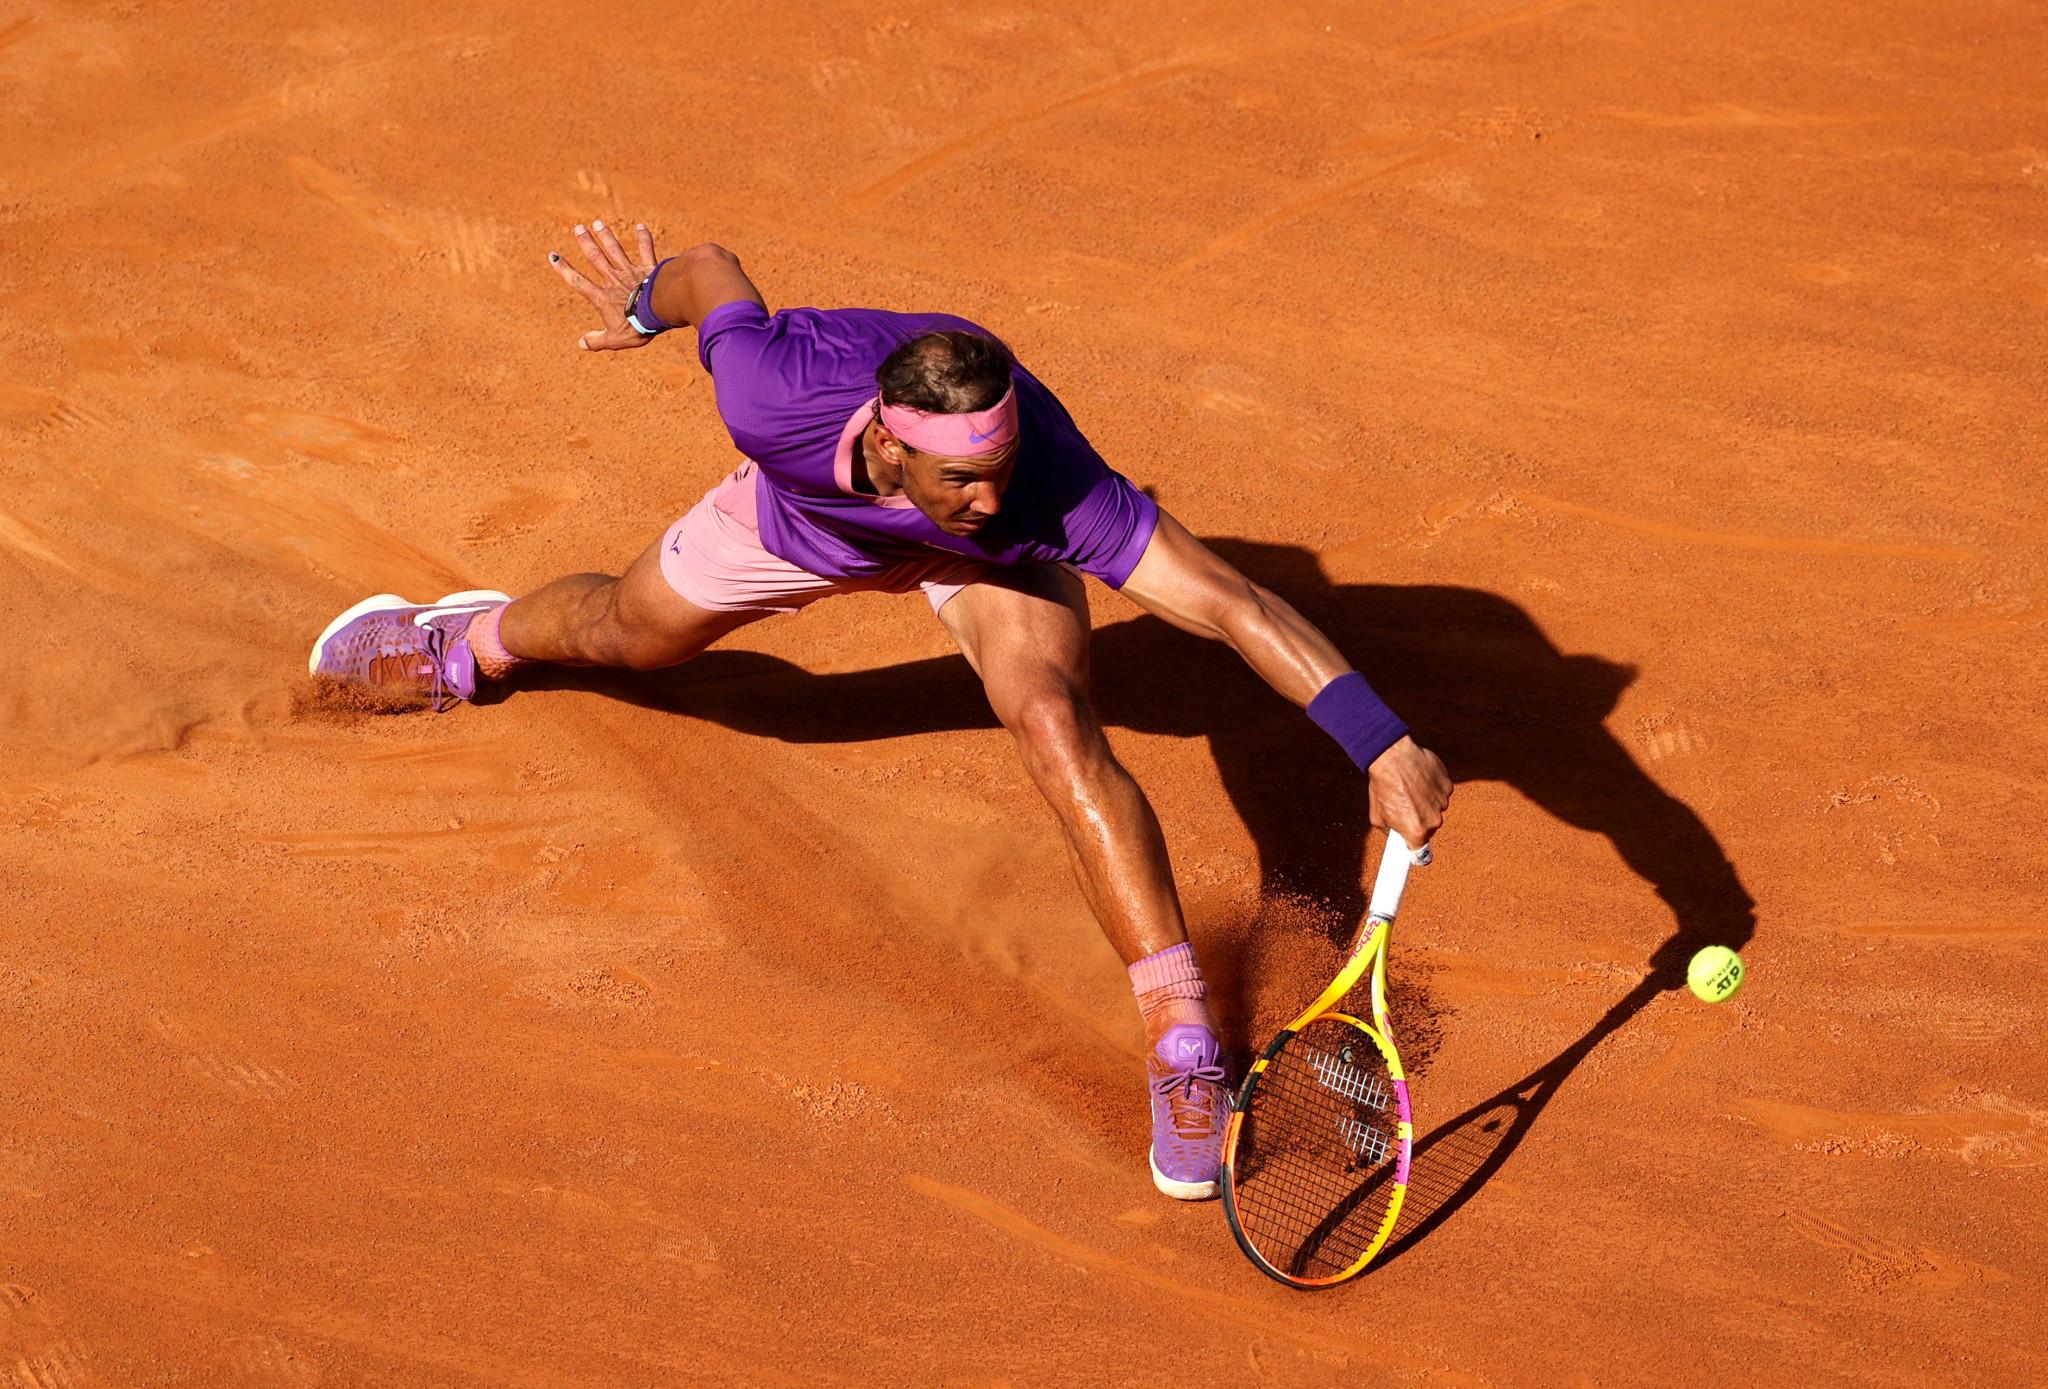 Nadal battles through at Italian Open as top seeds make smooth progress